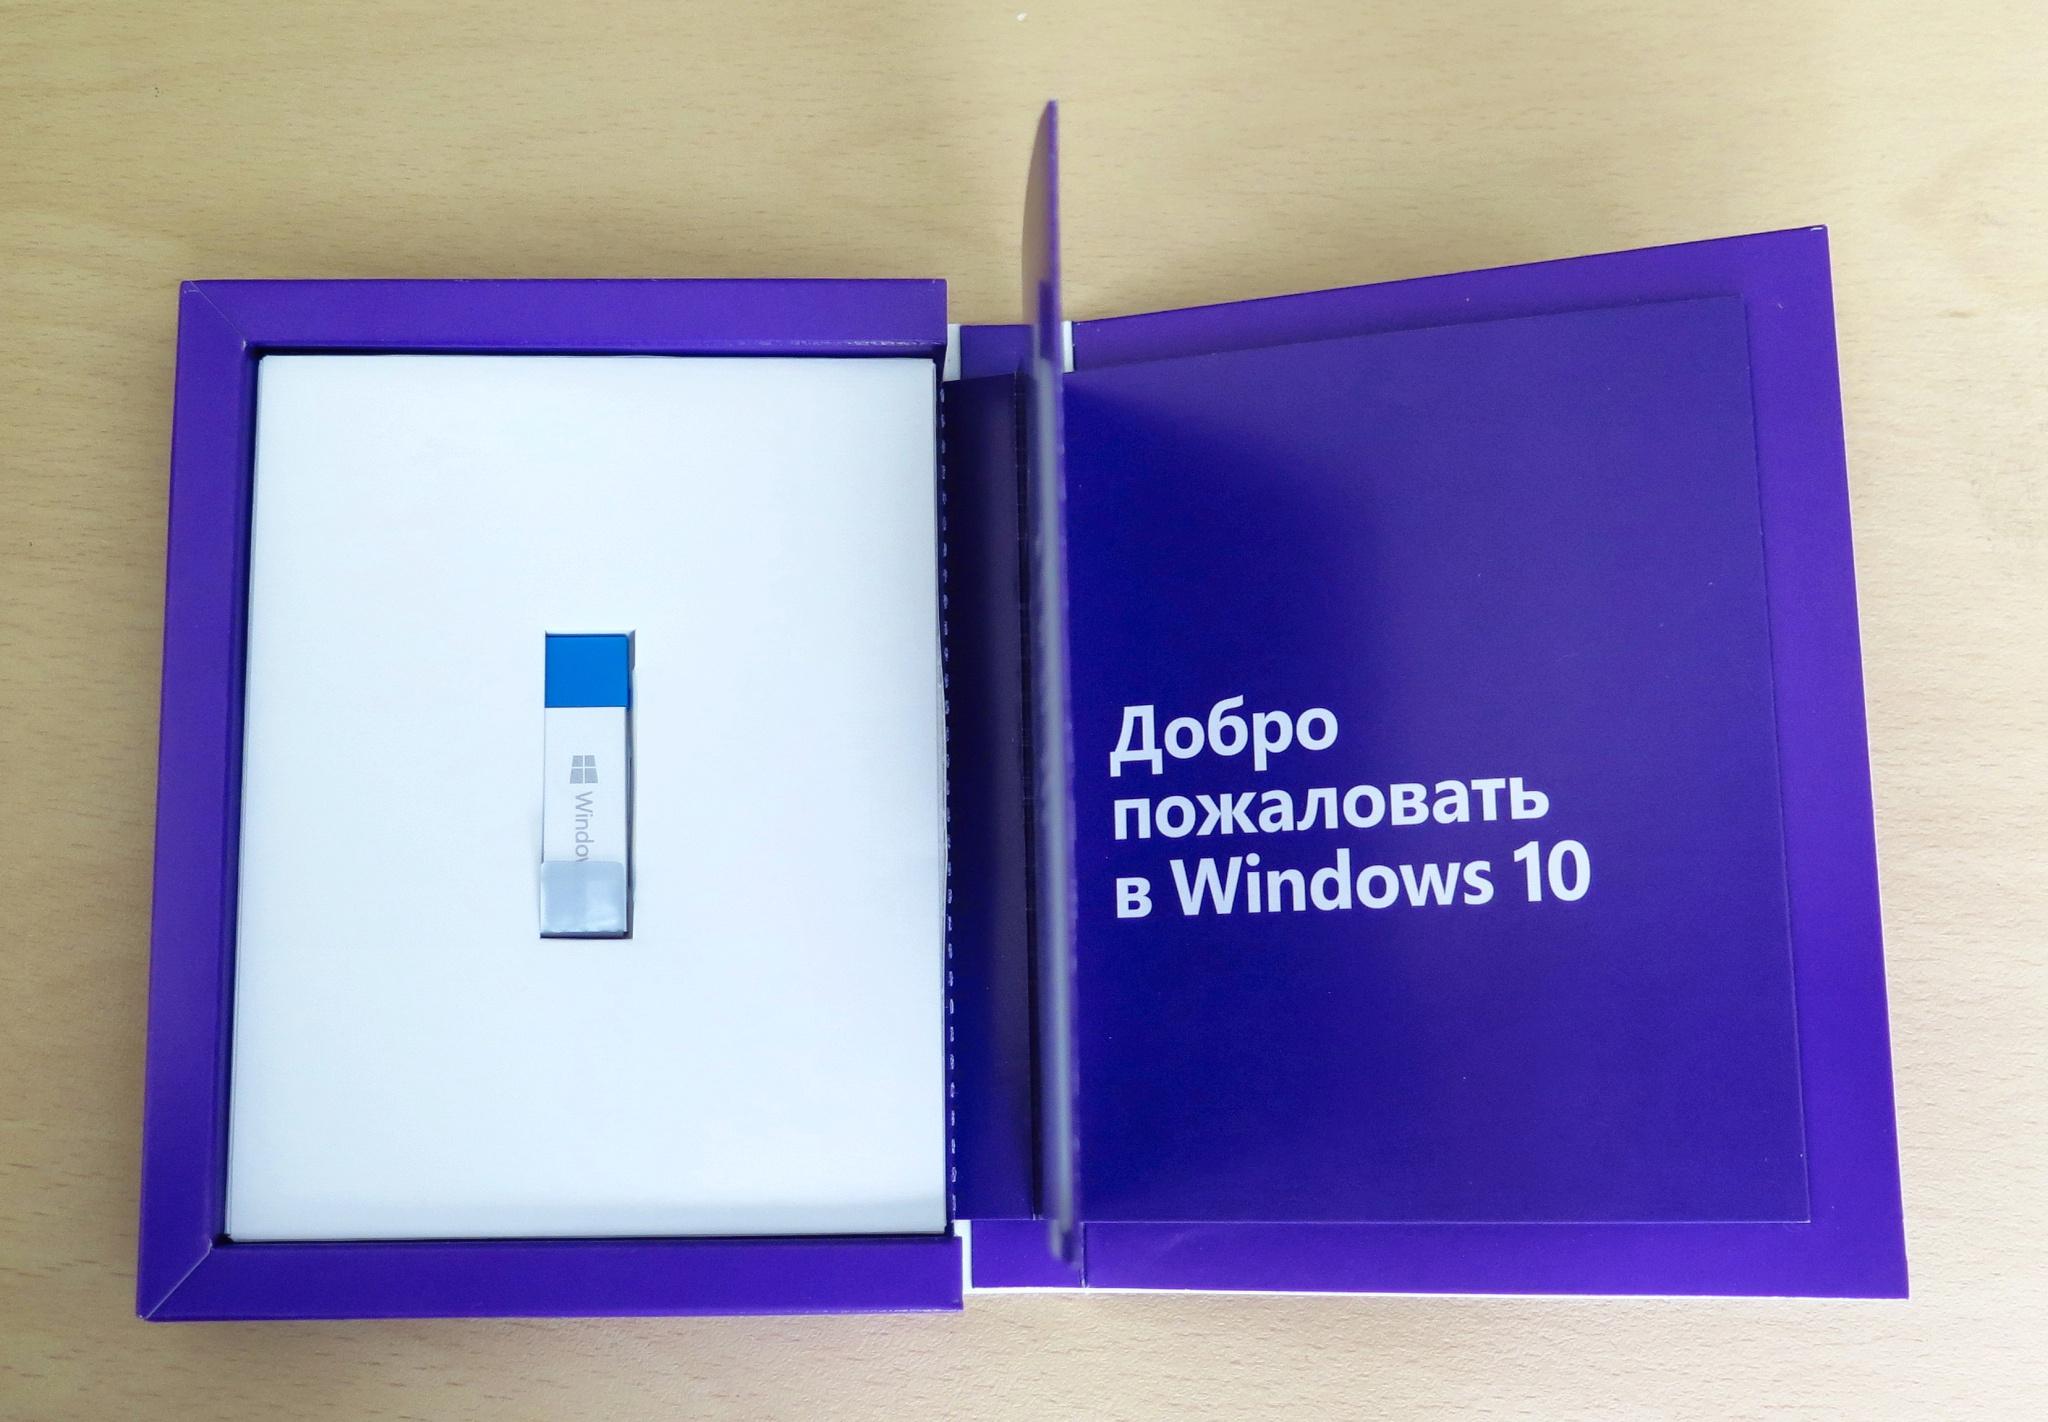 Виндовс 10 обзор на русском